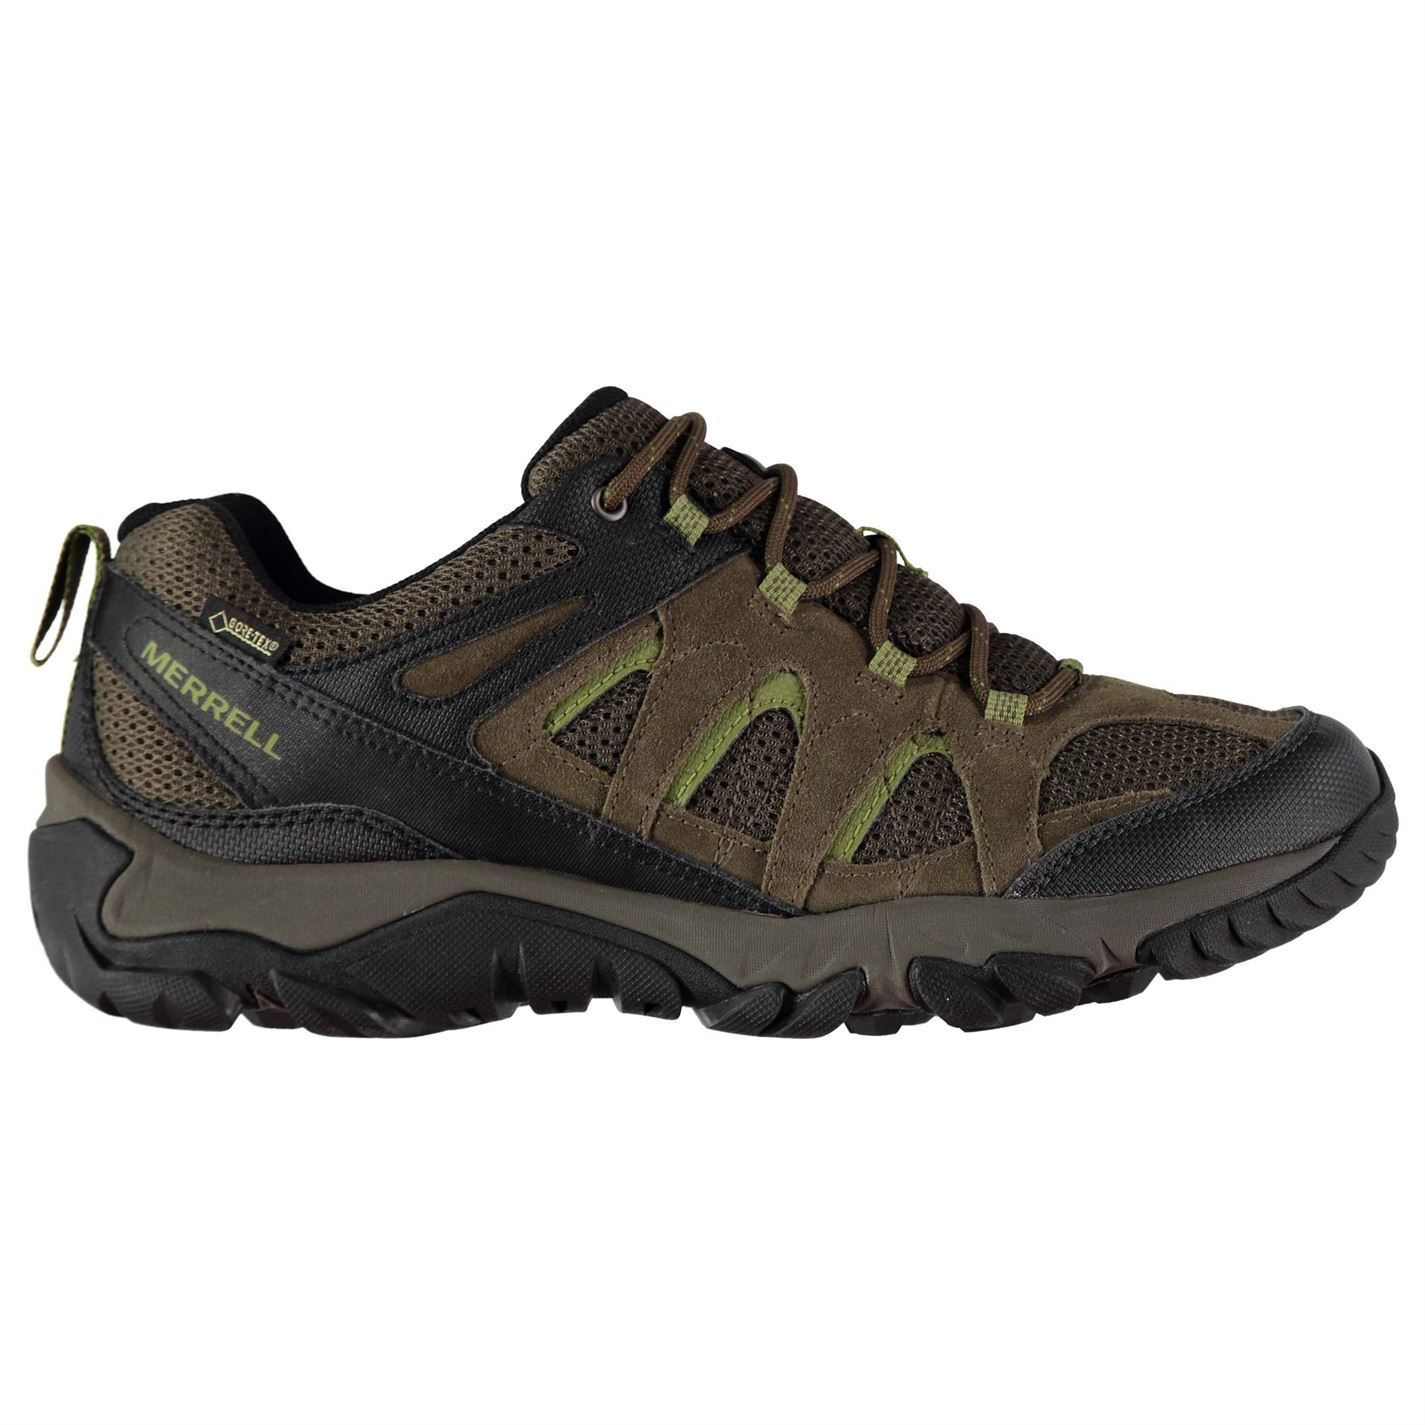 zapatos salomon hombre amazon outlet nz fashion yokudan